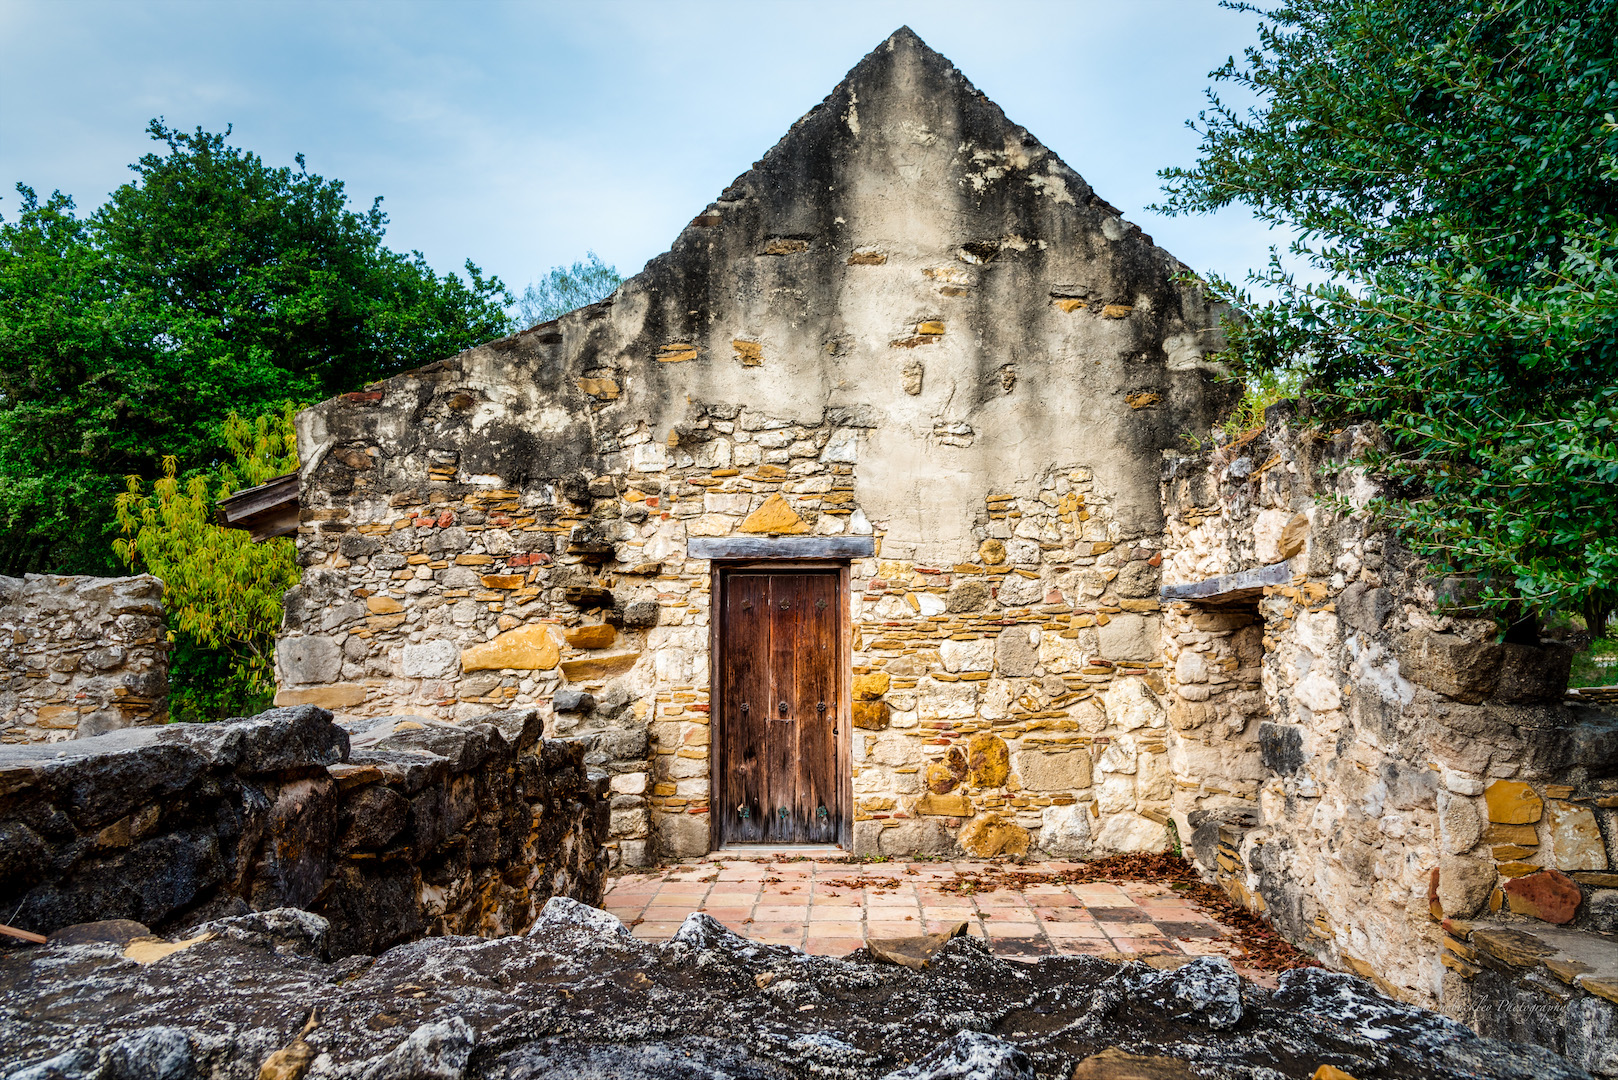 Mission San Juan4